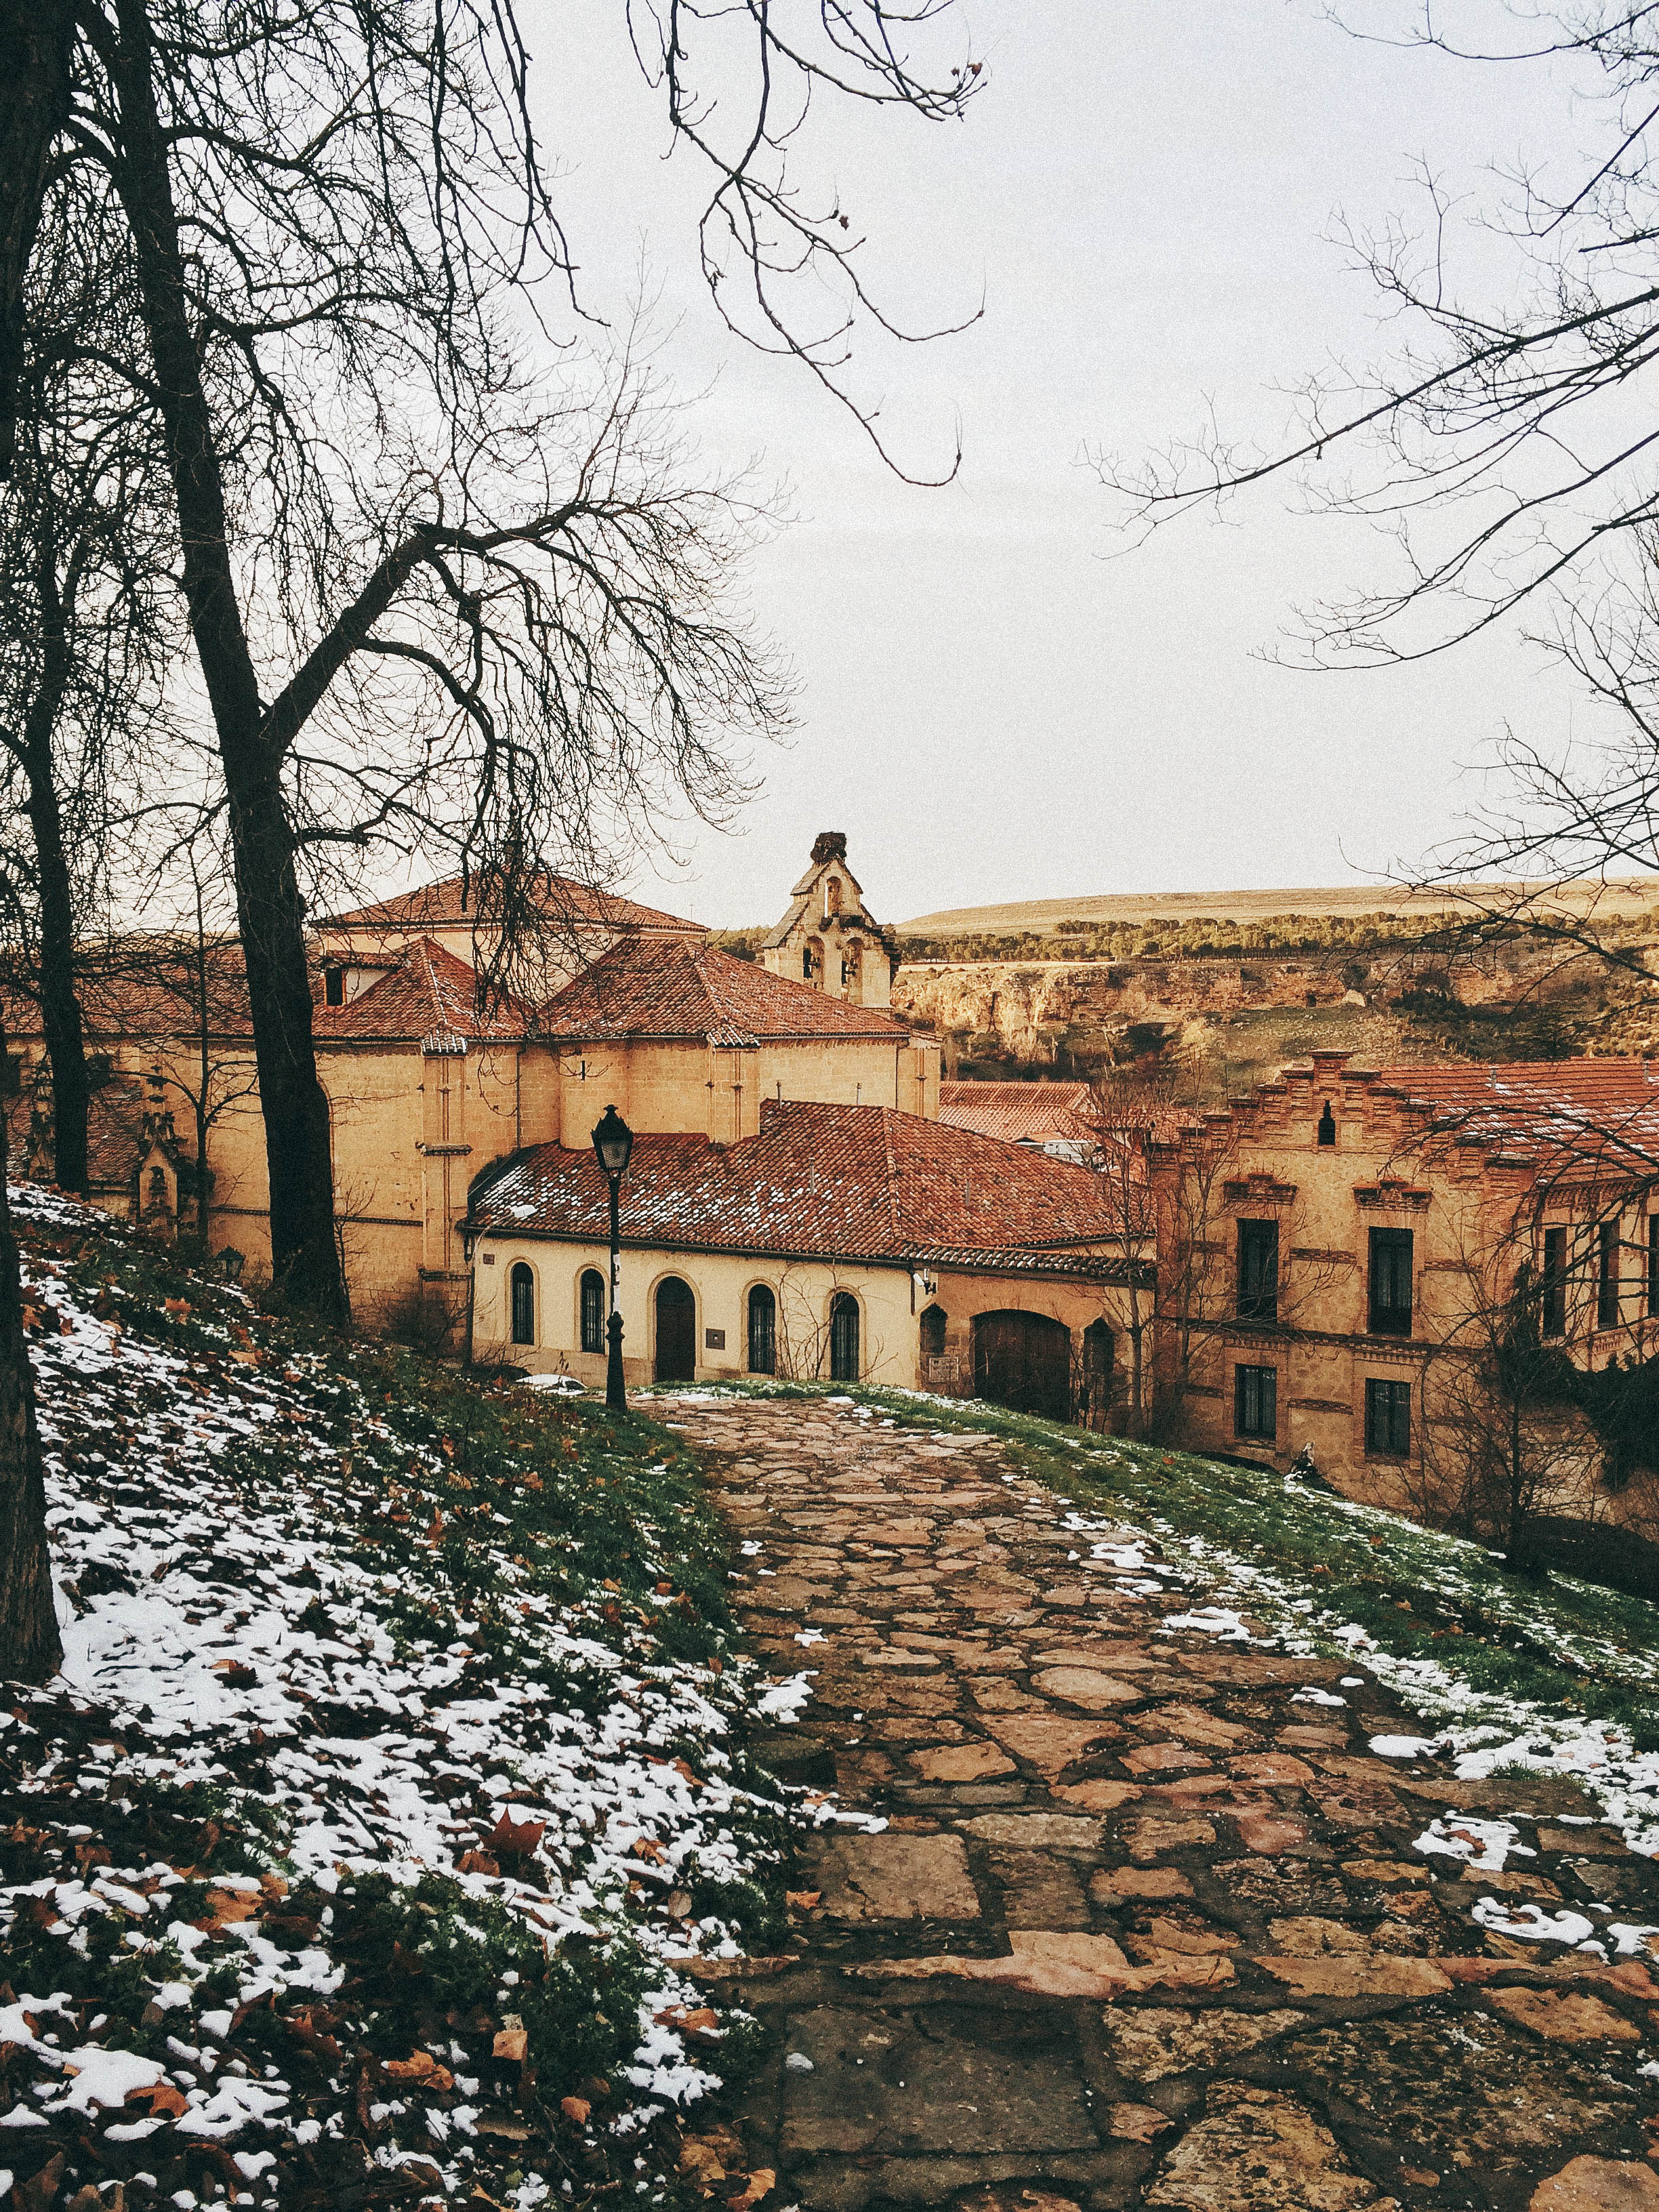 Segovia_Feb2015-6.jpg